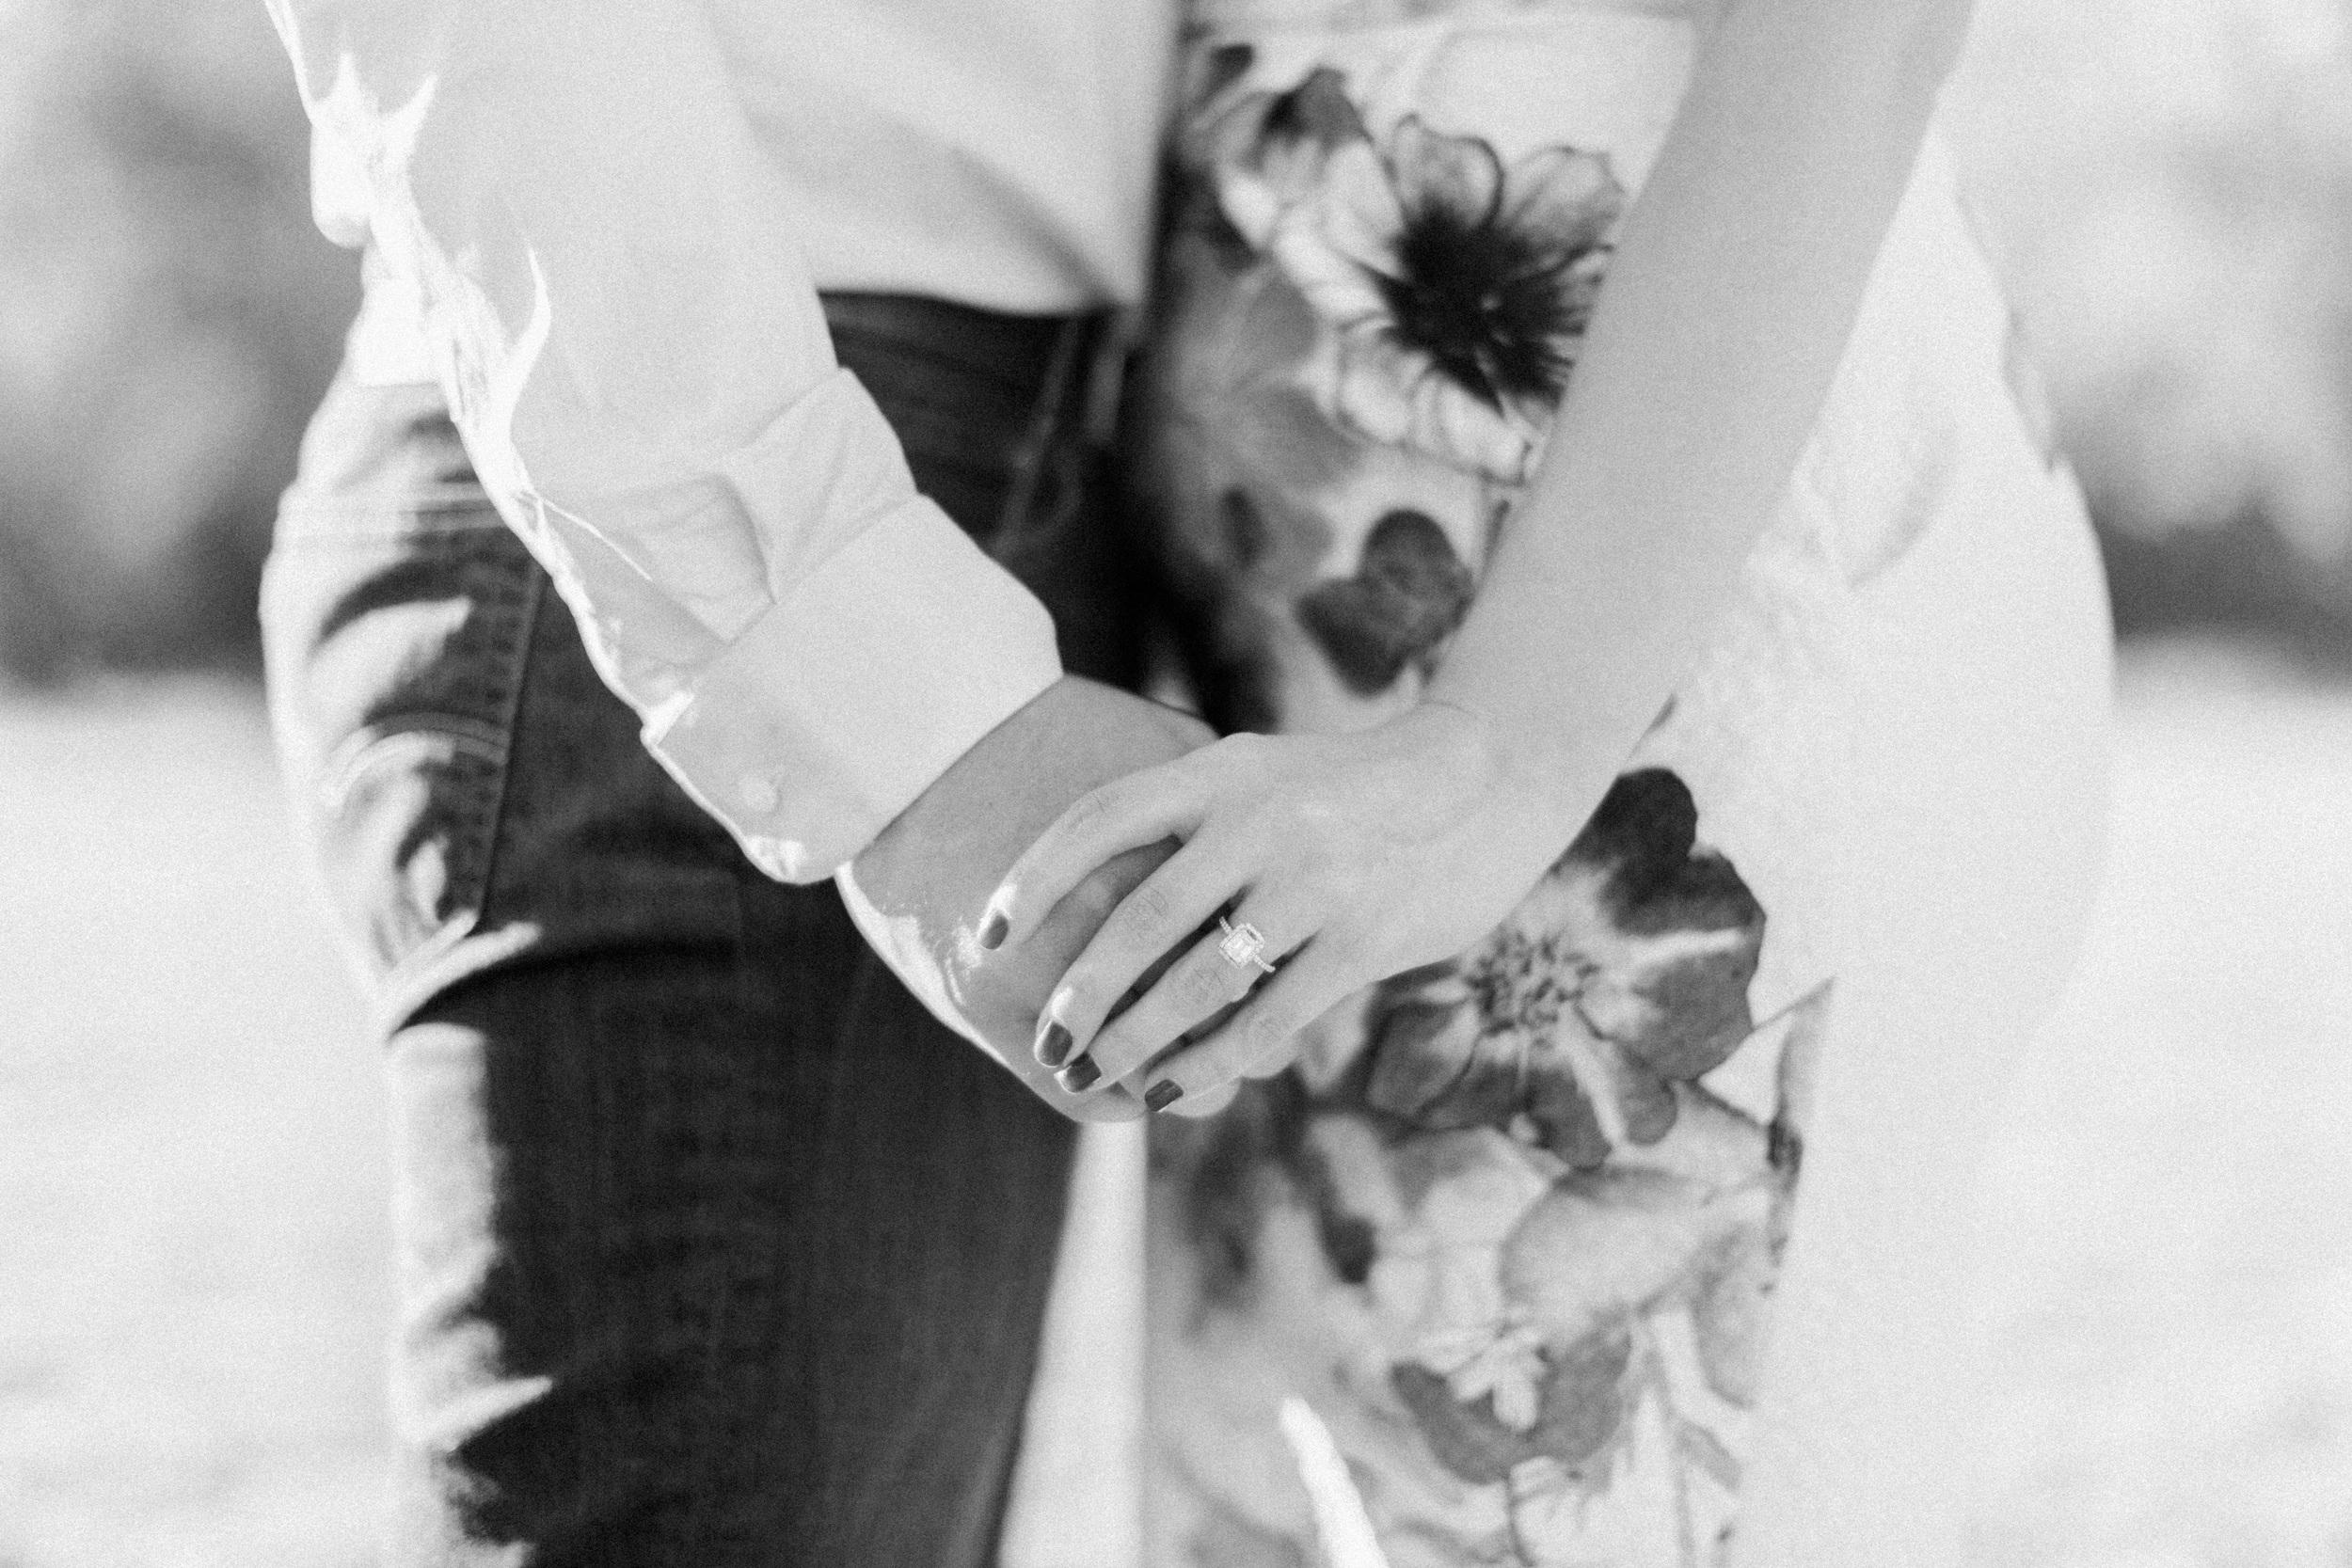 sedona-engagement-brealyn-nenes-photography